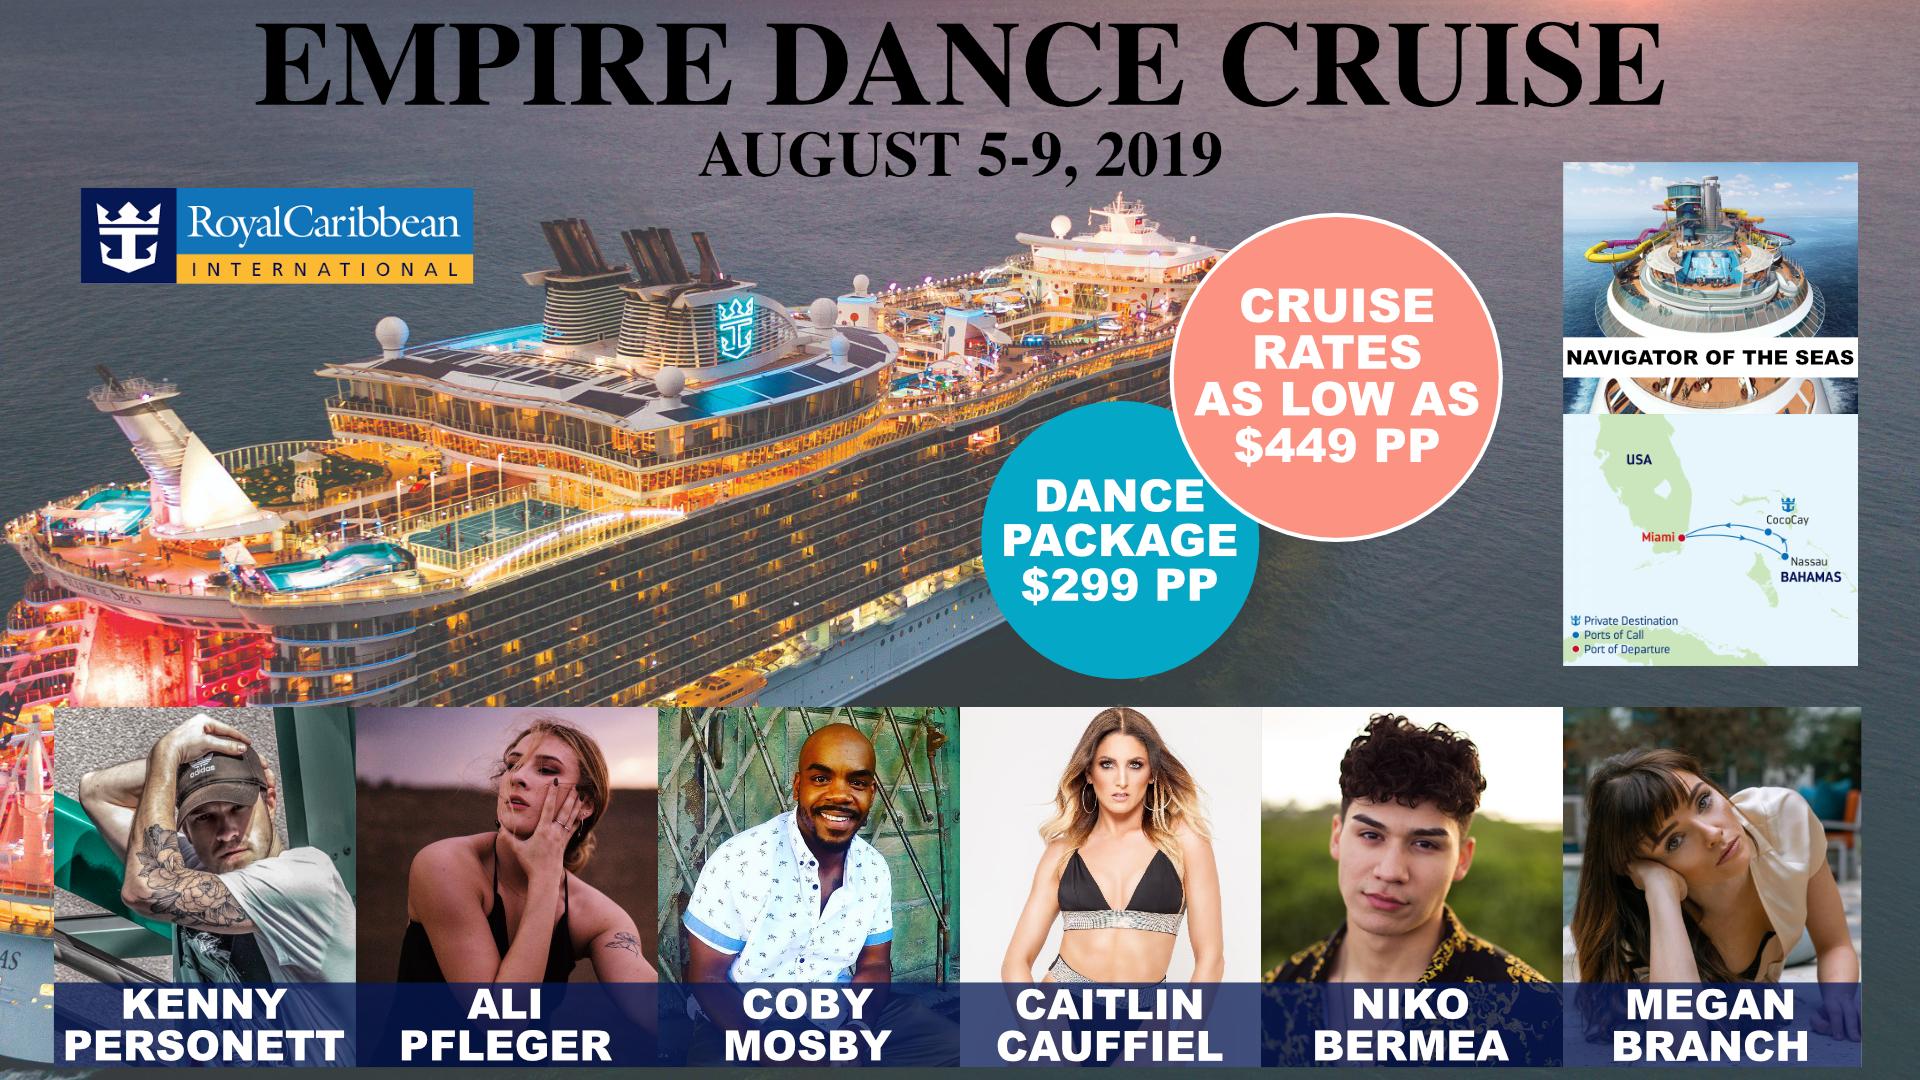 DANCE CRUISE 1920 X 1080.jpg